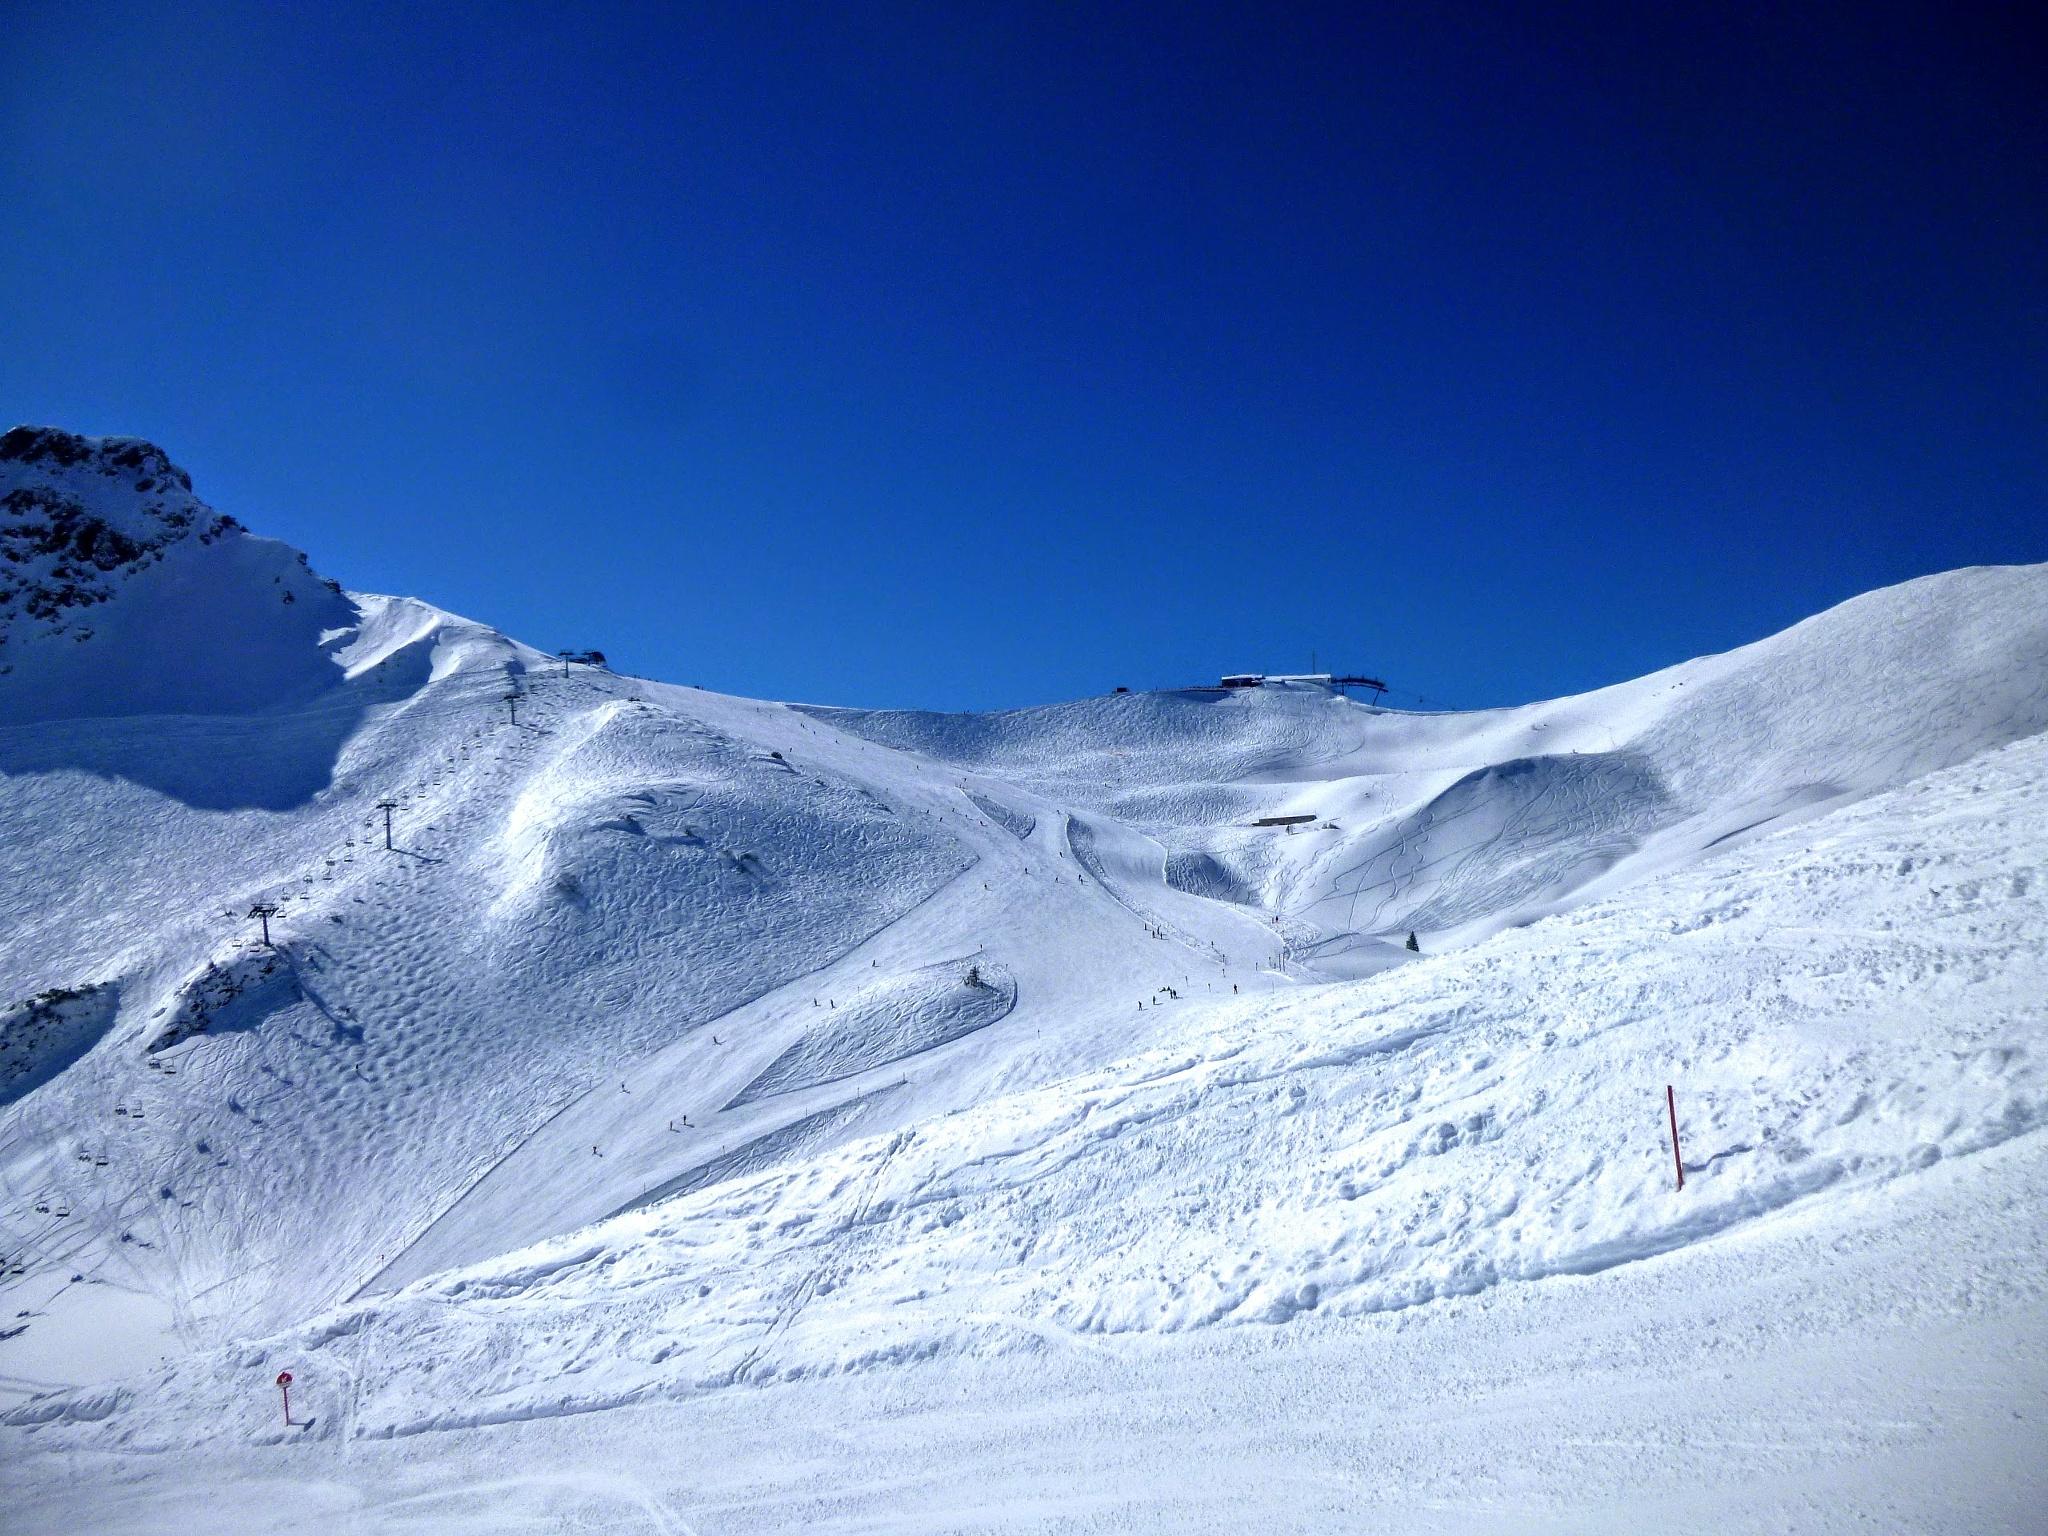 Skiing at Kanzelwand Kleinwalsertal Vorarlberg by Pension Gatterhof Kleinwalsertal